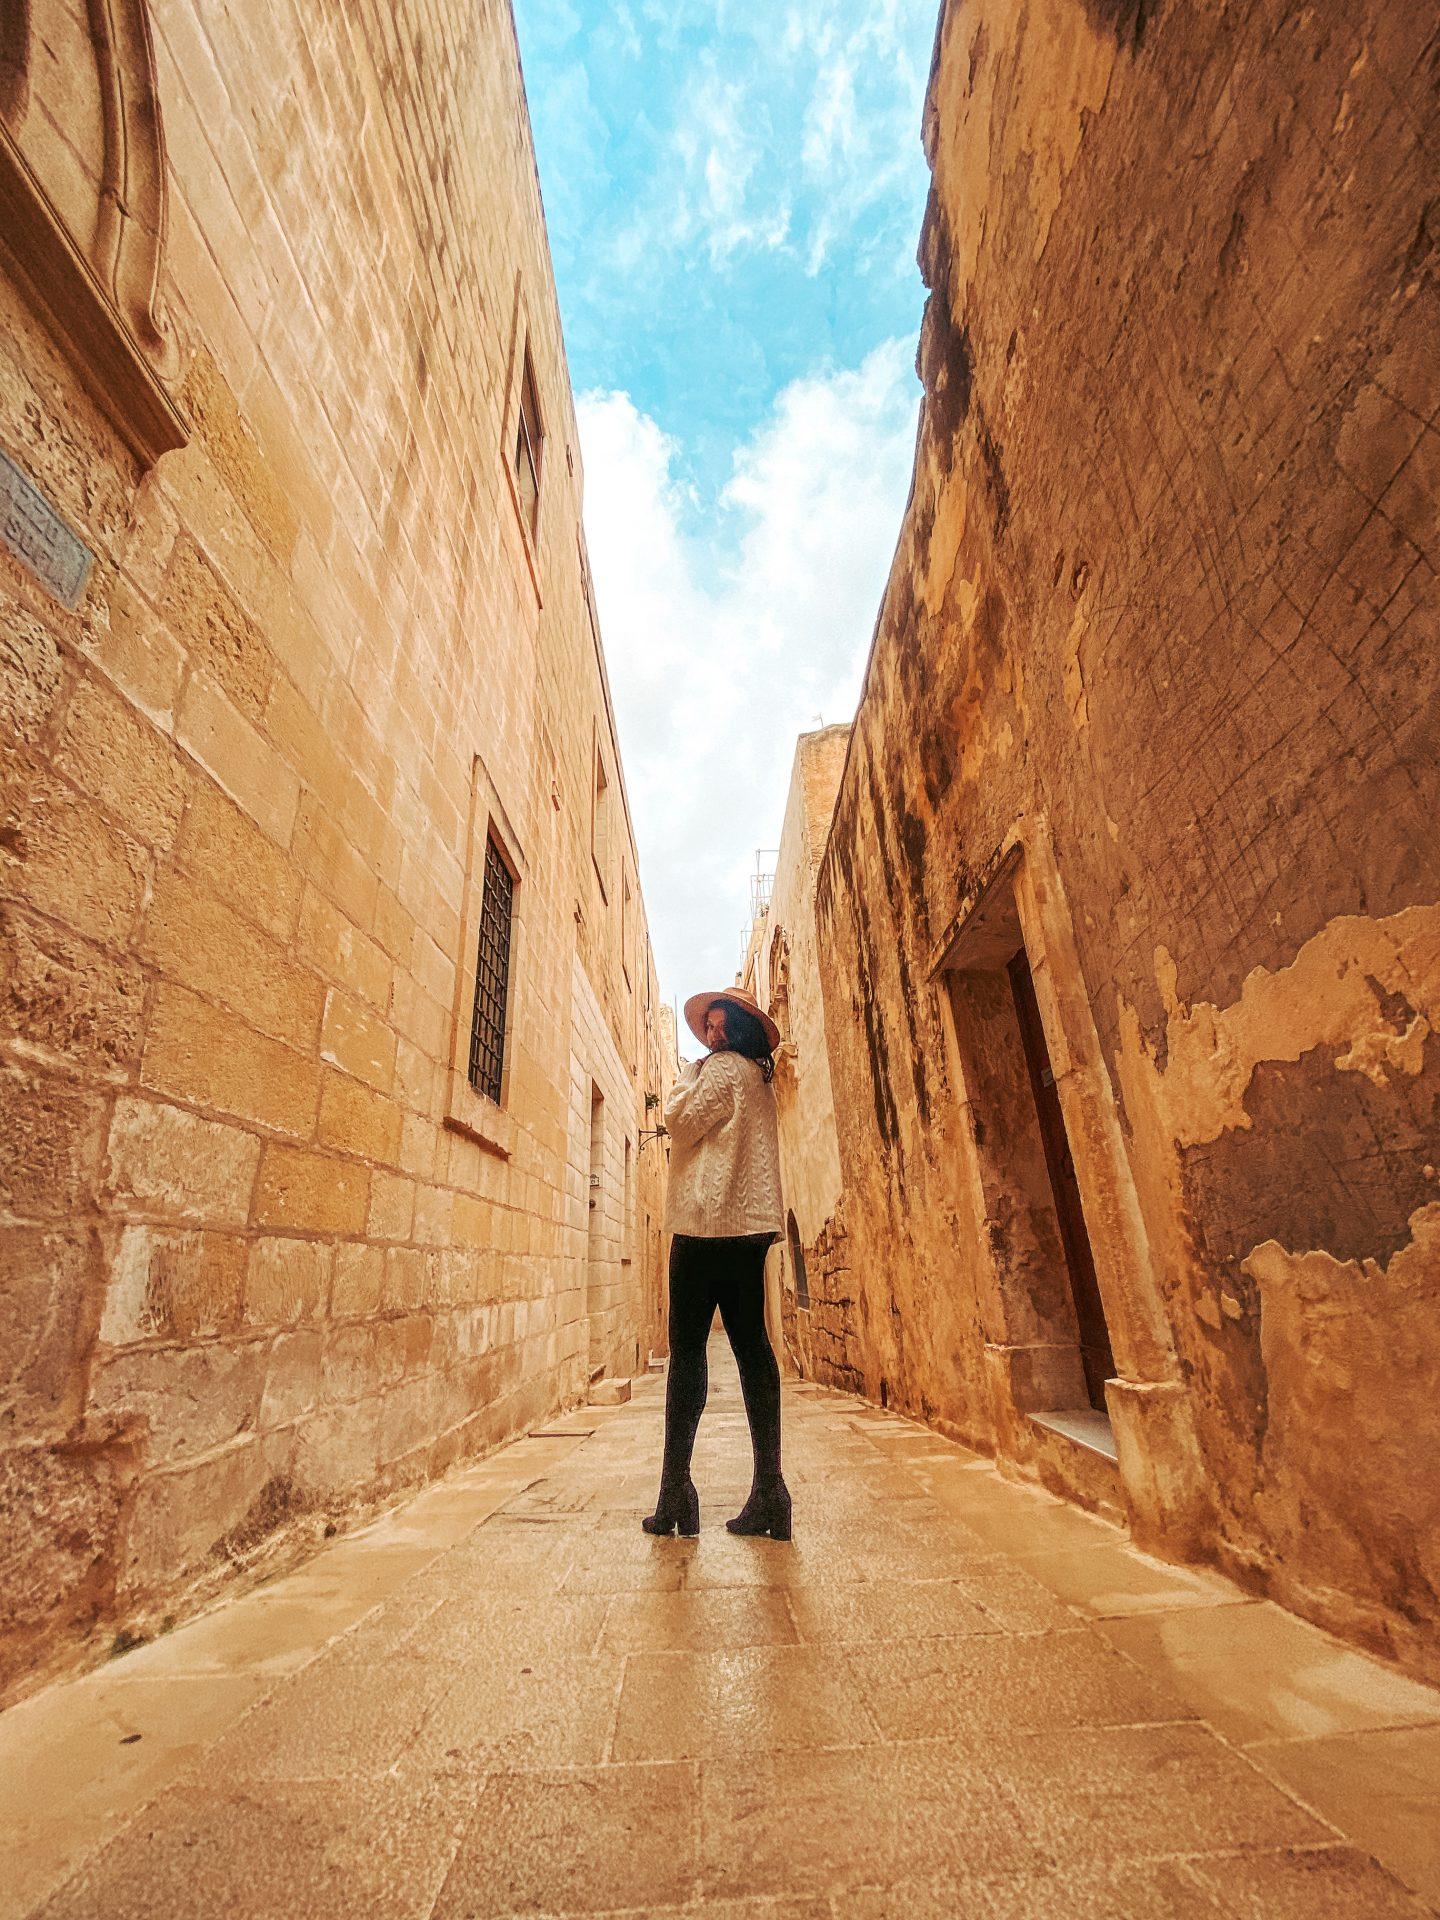 mdina-malta-streets-medieval-instagram